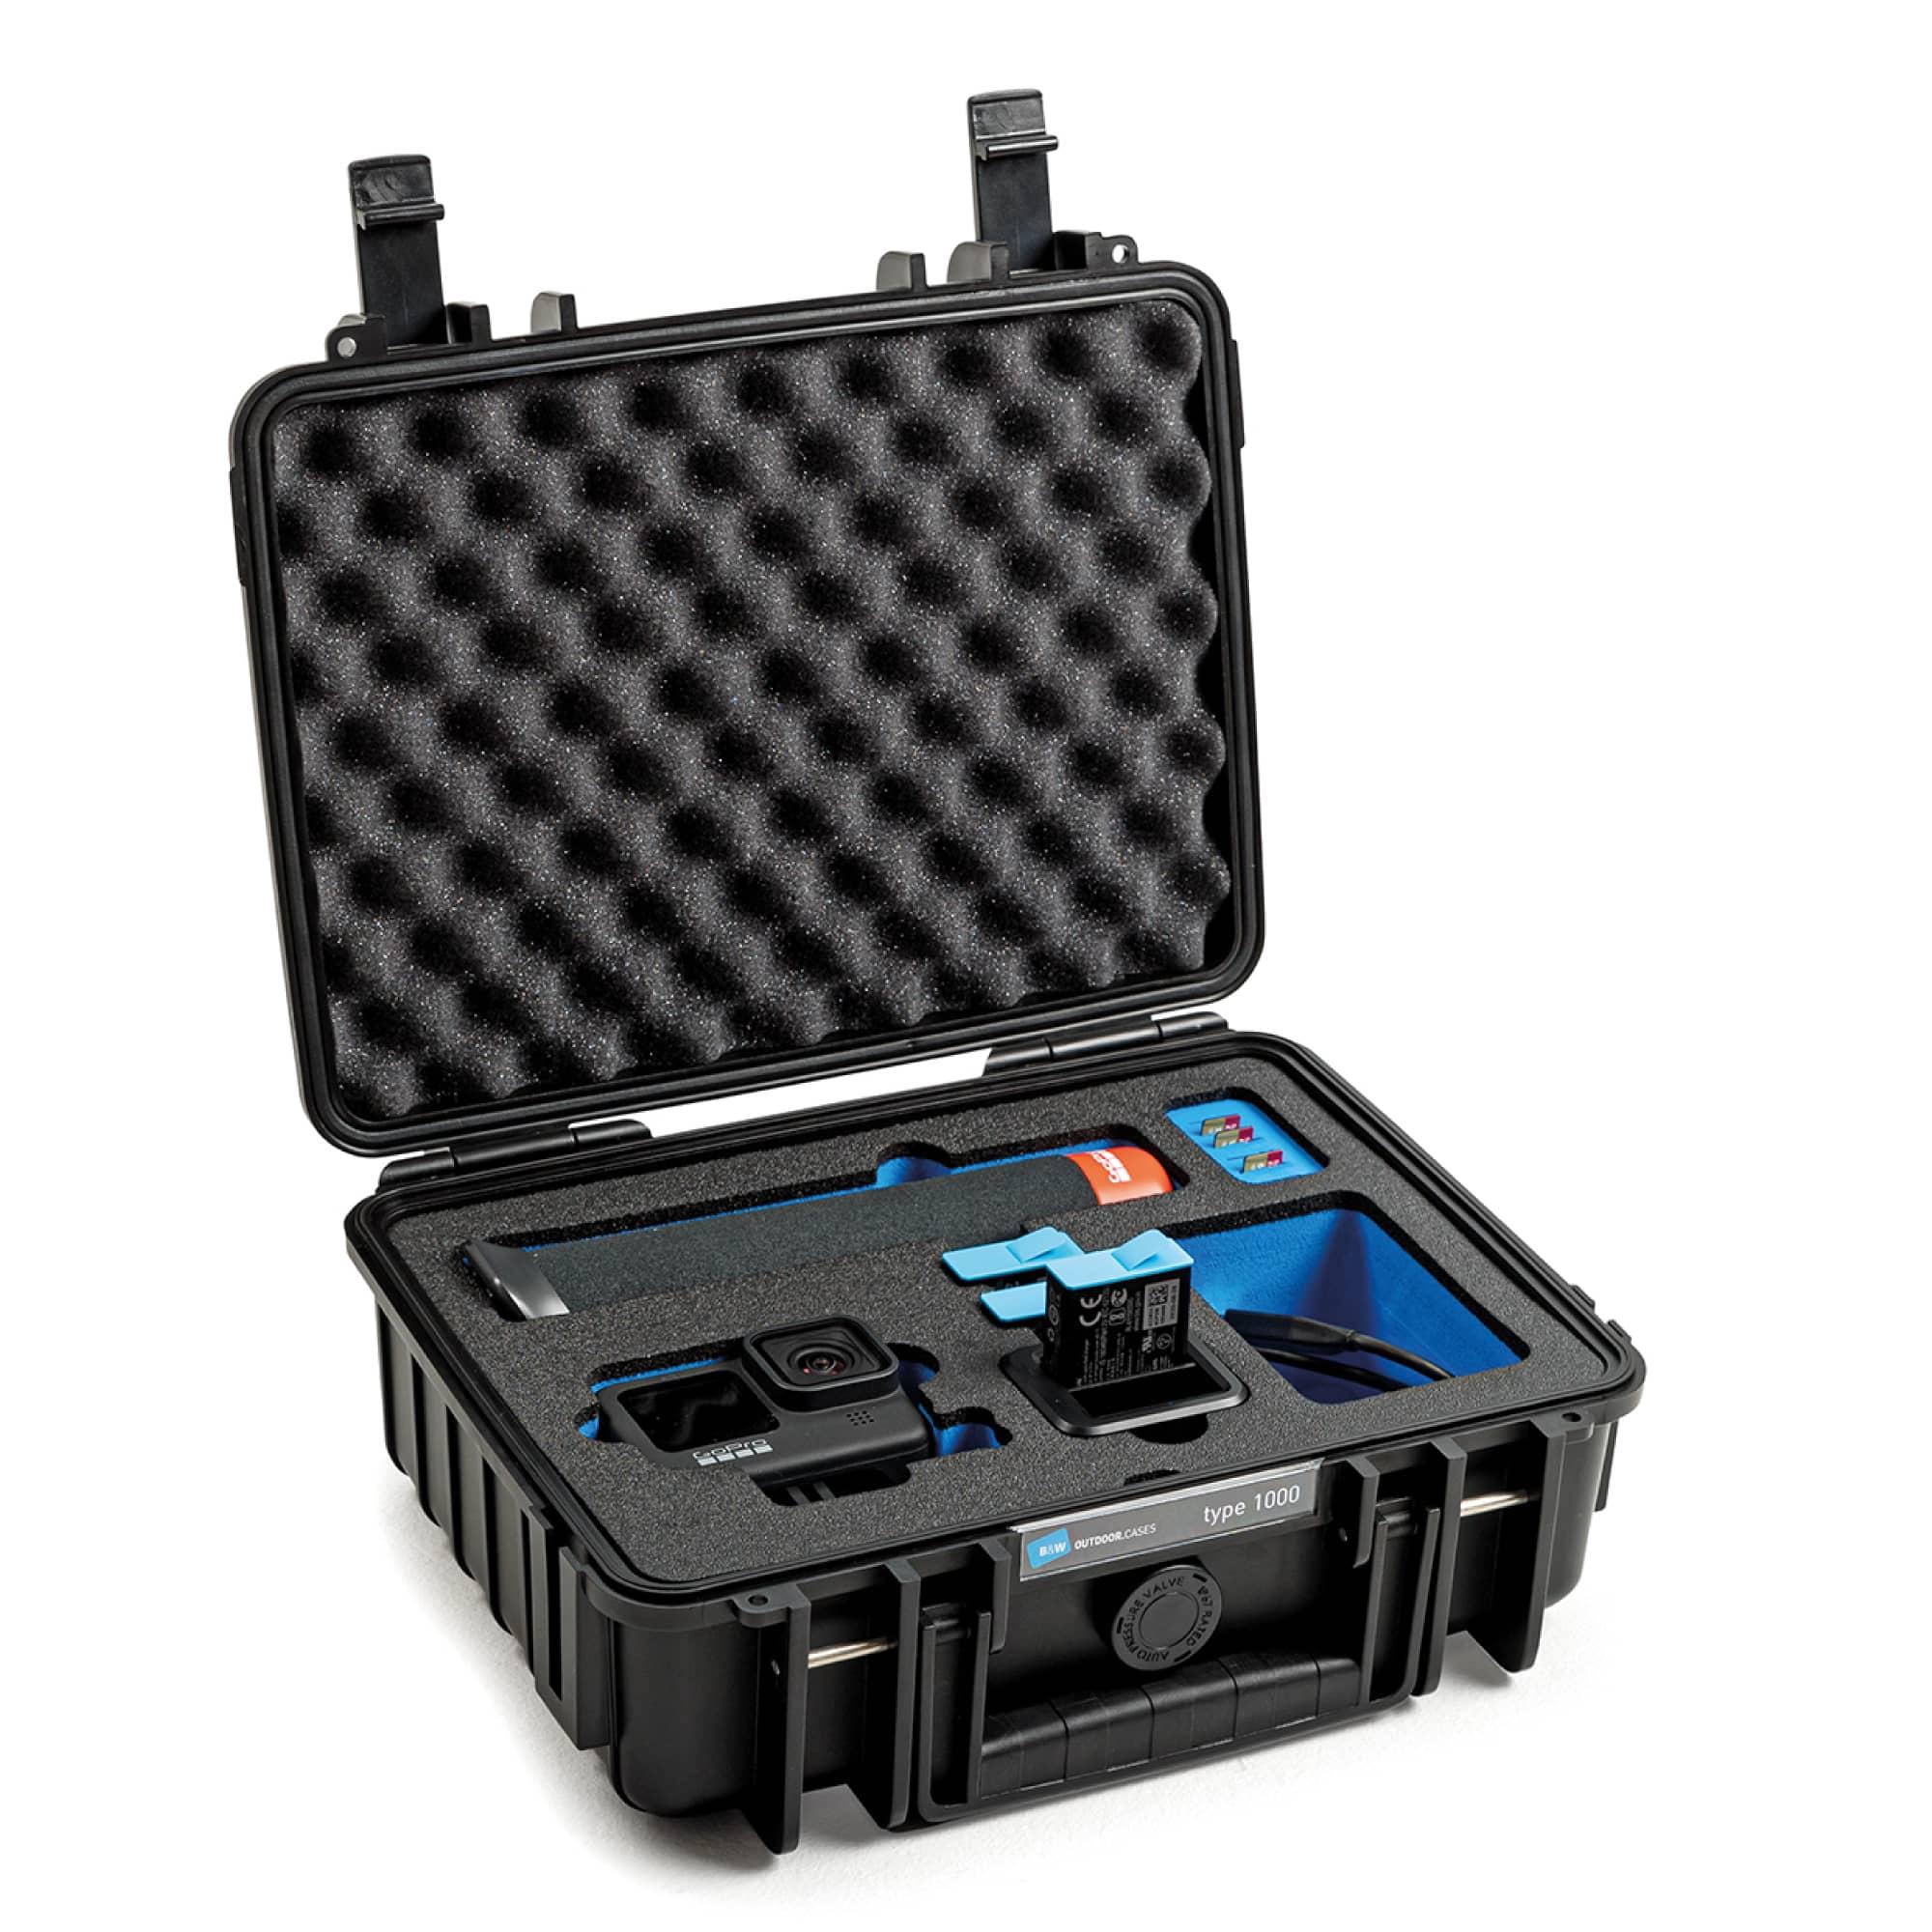 B&W Special Case Tye 1000 for GoPro 9/10